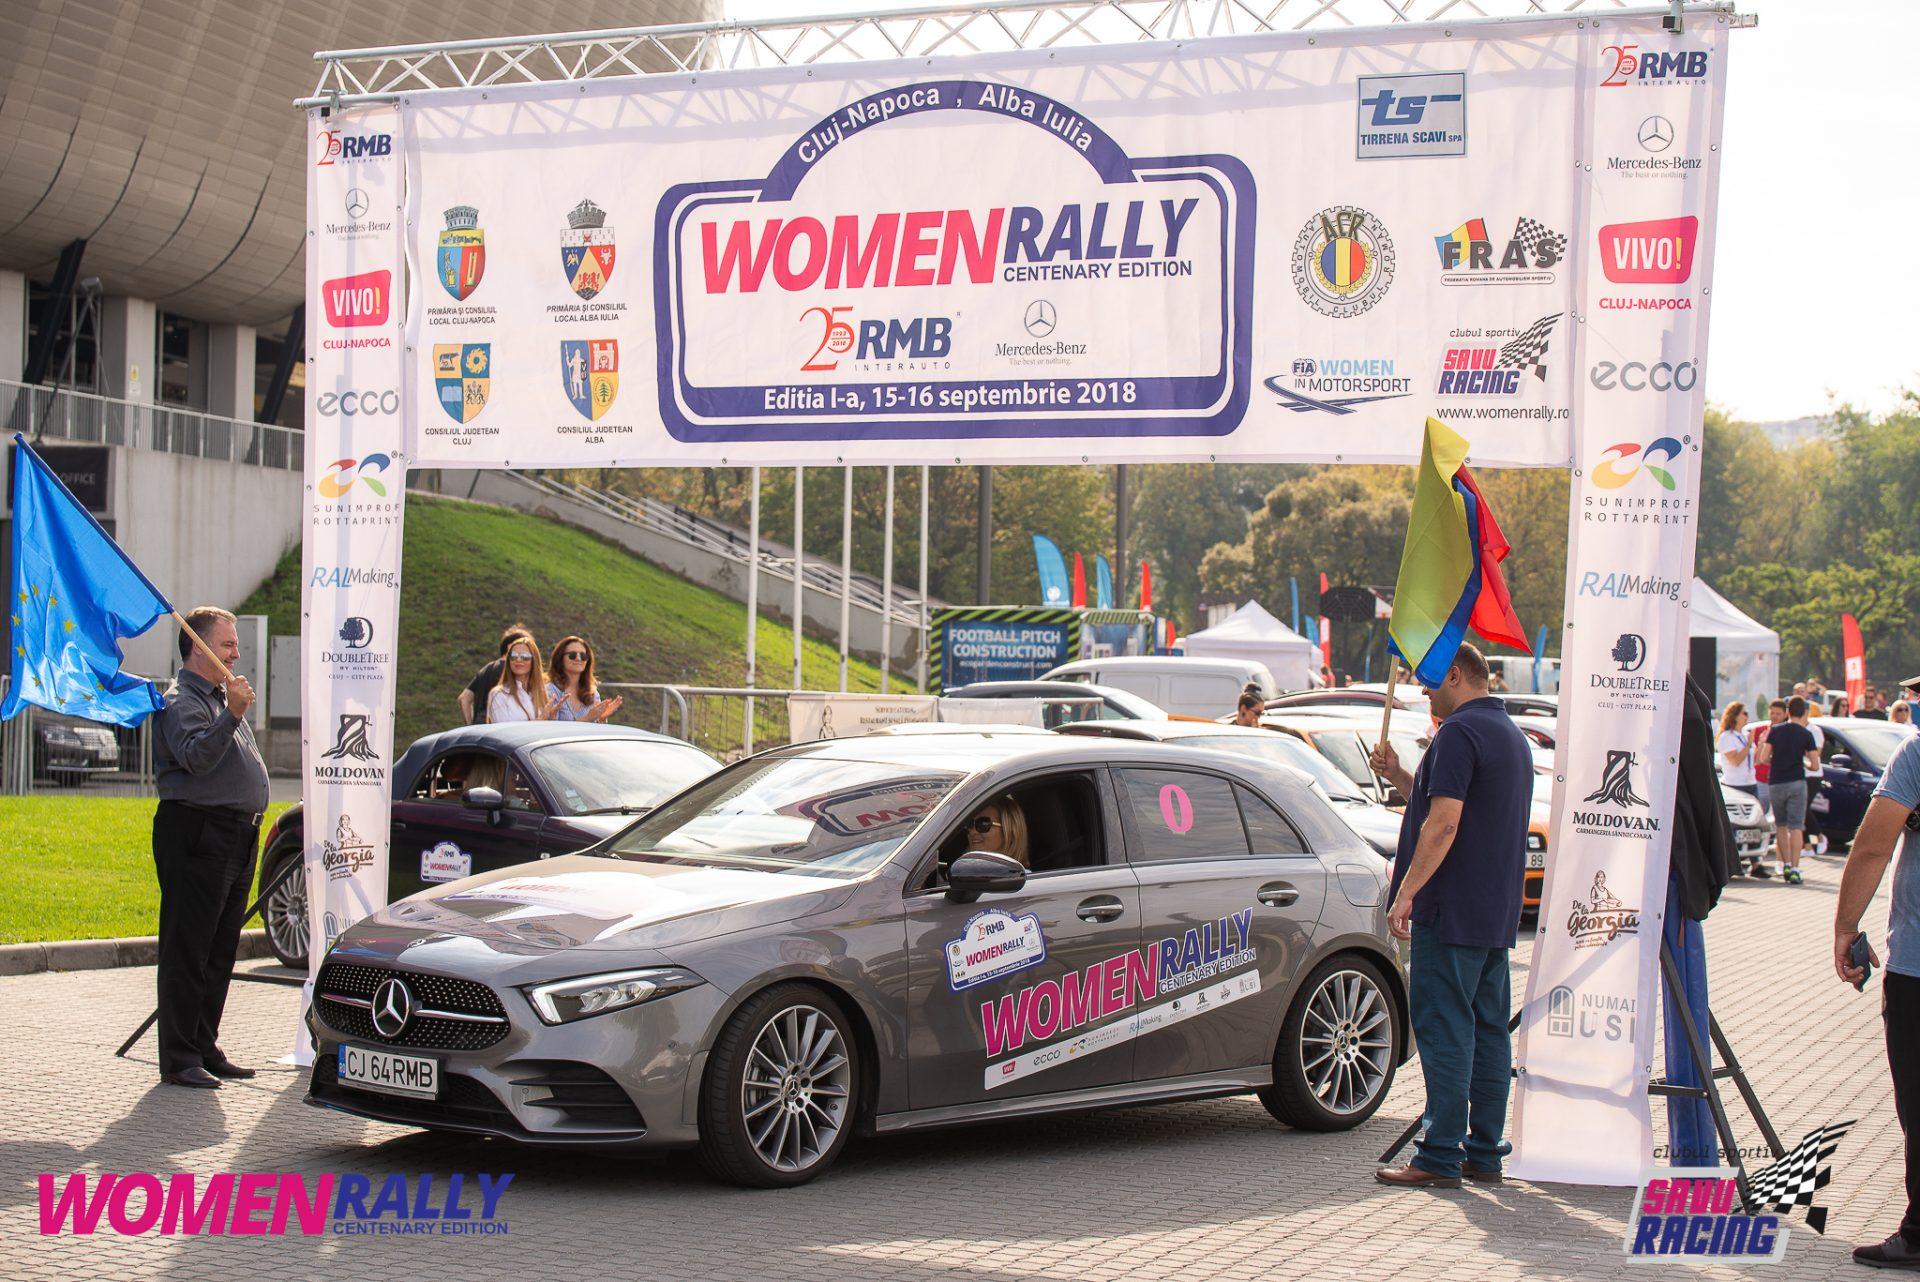 Women Rally 2019 – Un campionat dedicat femeilor